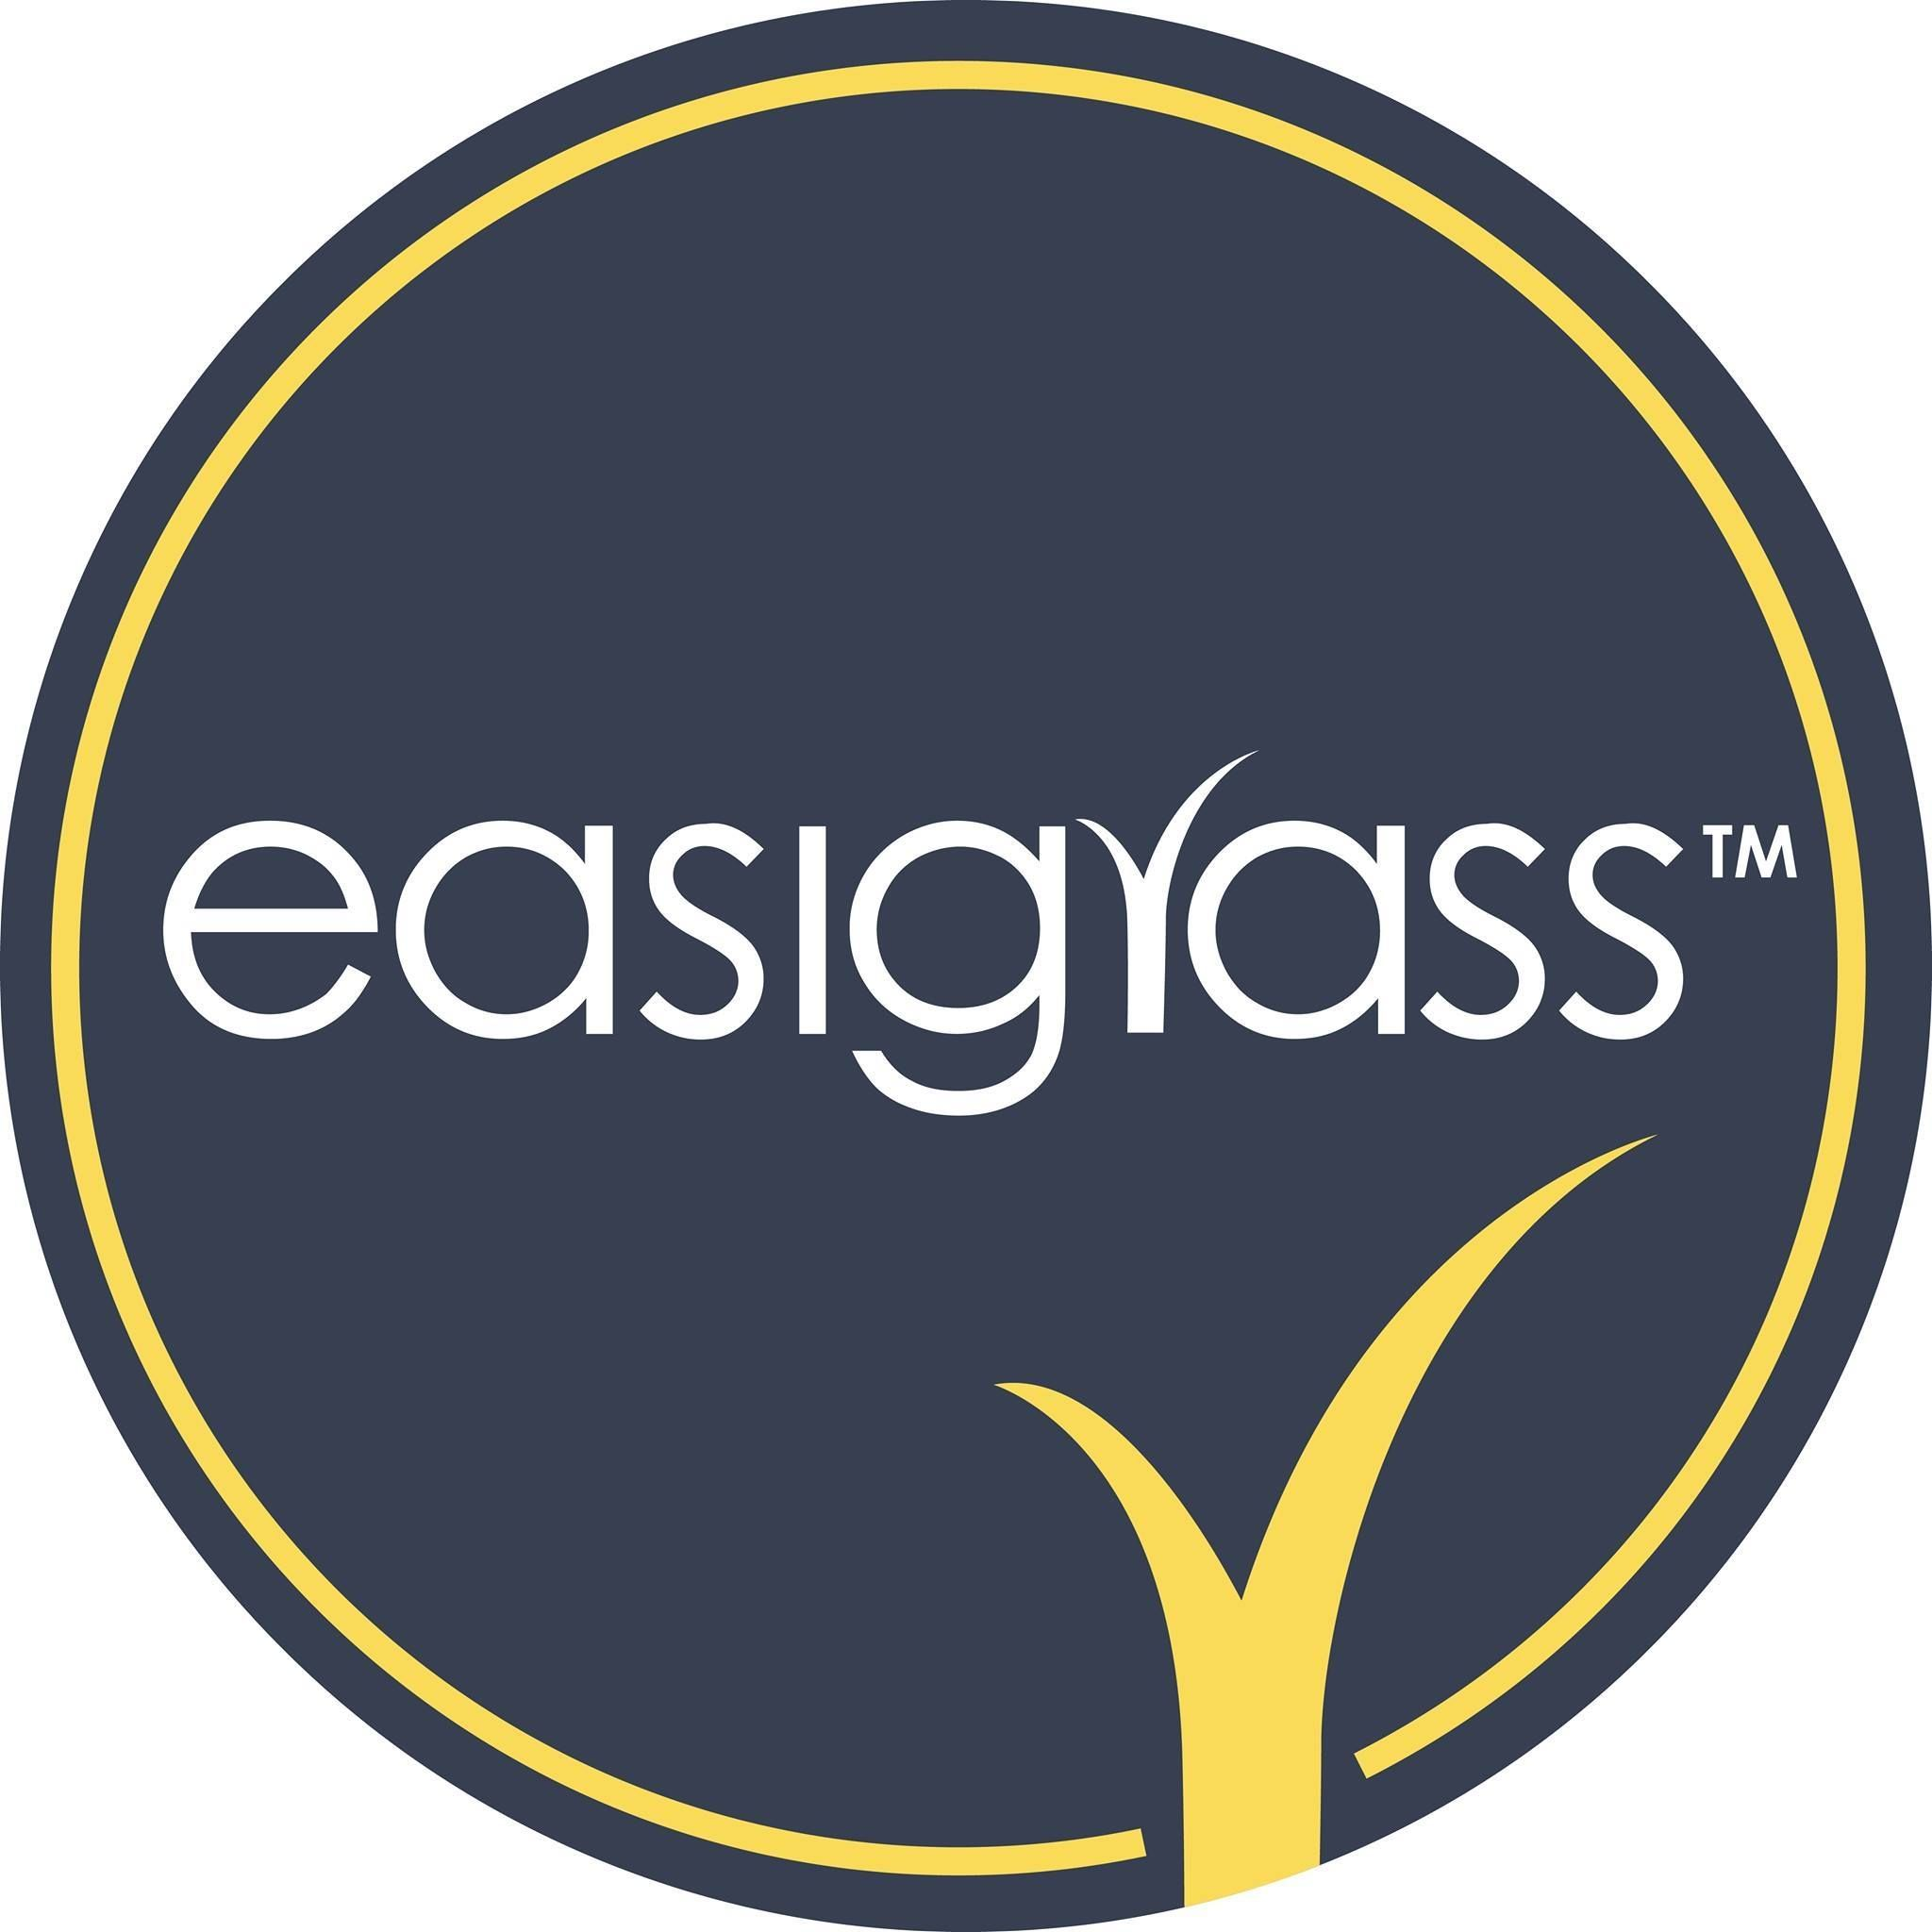 Easigrass Distribution Ltd